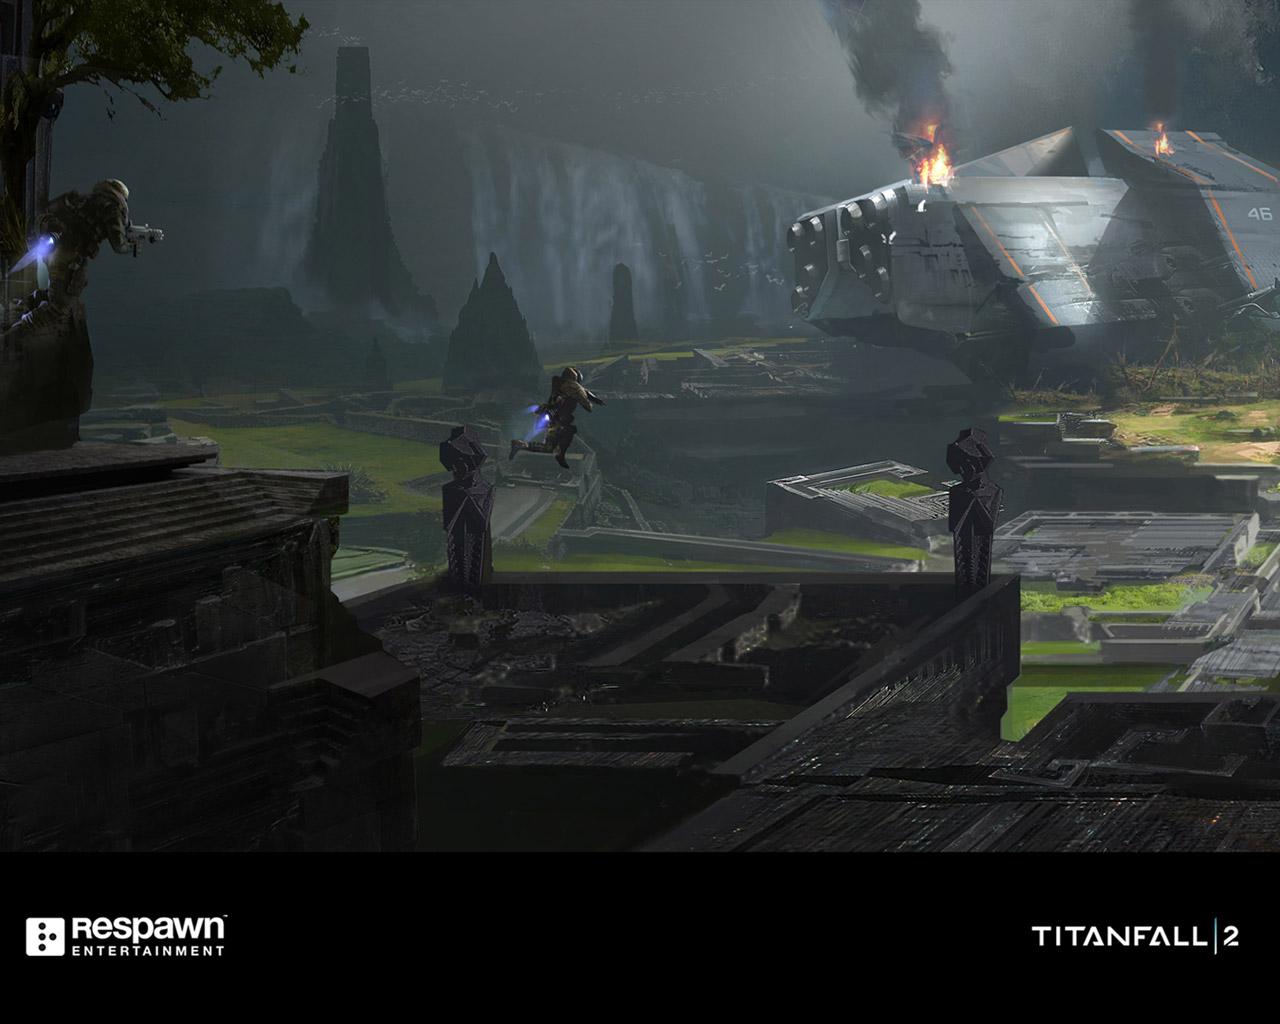 Titanfall 2 Wallpaper in 1280x1024